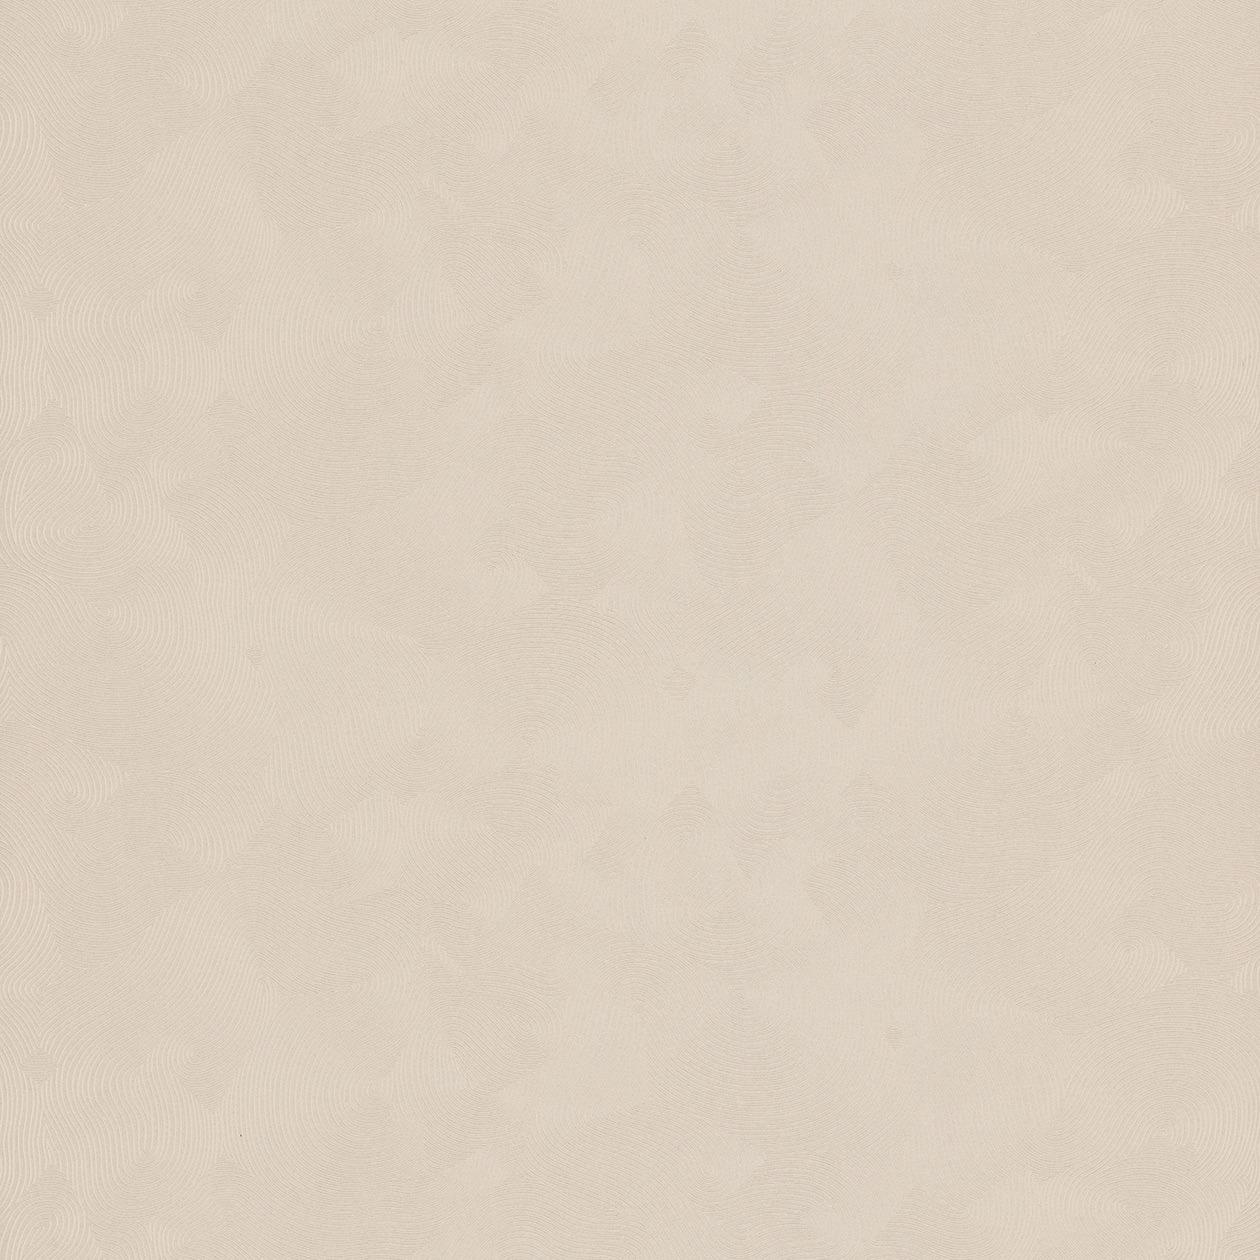 Французские обои Caselio,  коллекция Trio, артикулTIO68021010